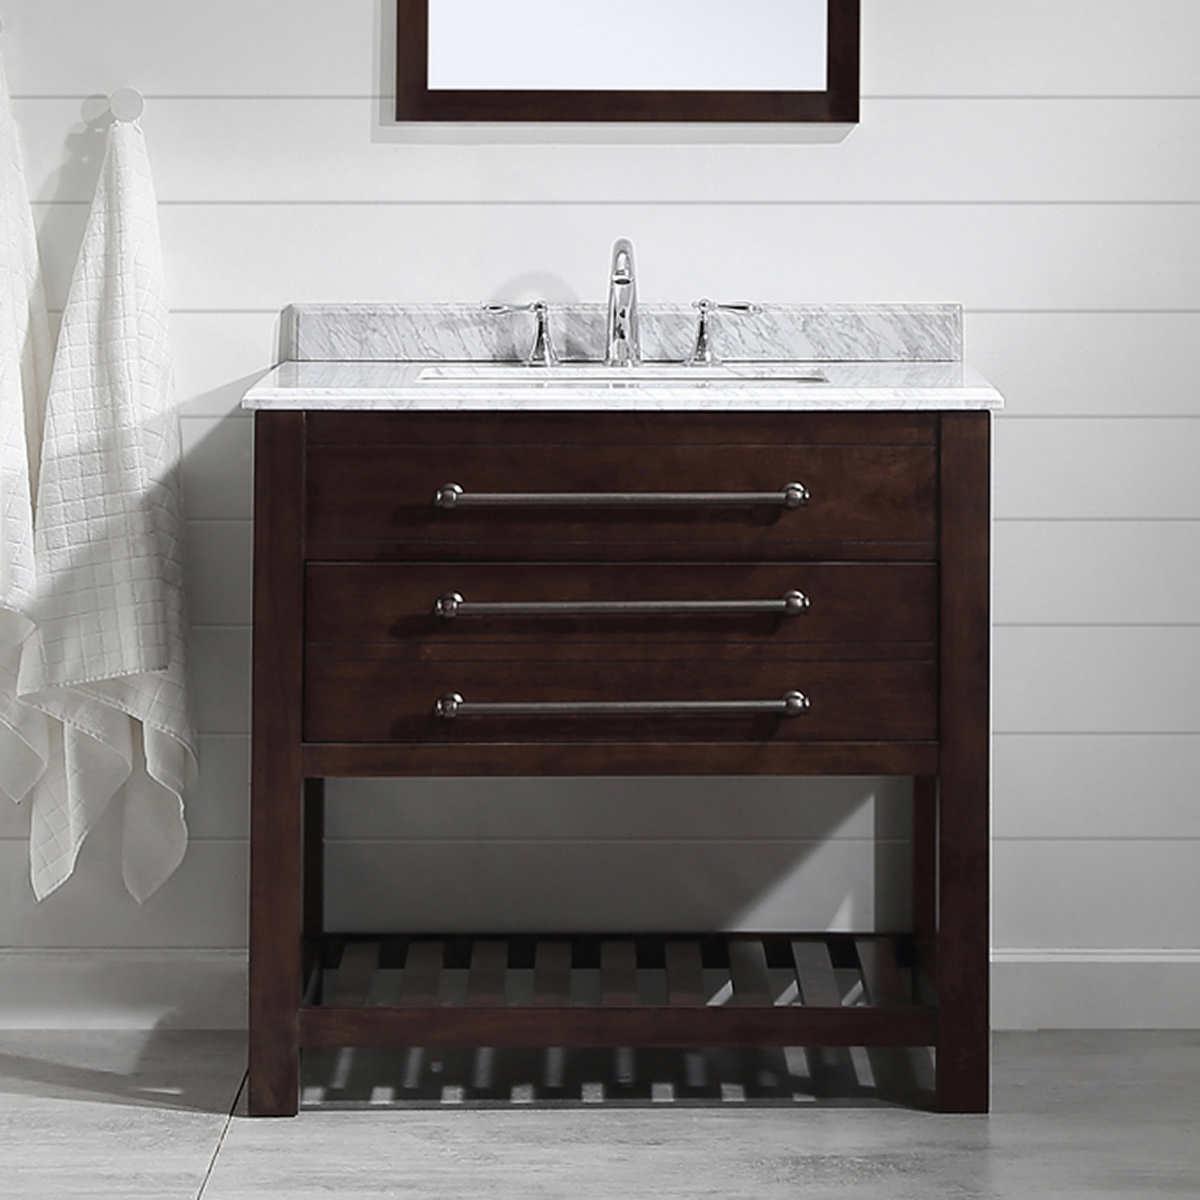 Bathroom cabinets ottawa - Bathroom Cabinets Ottawa 79